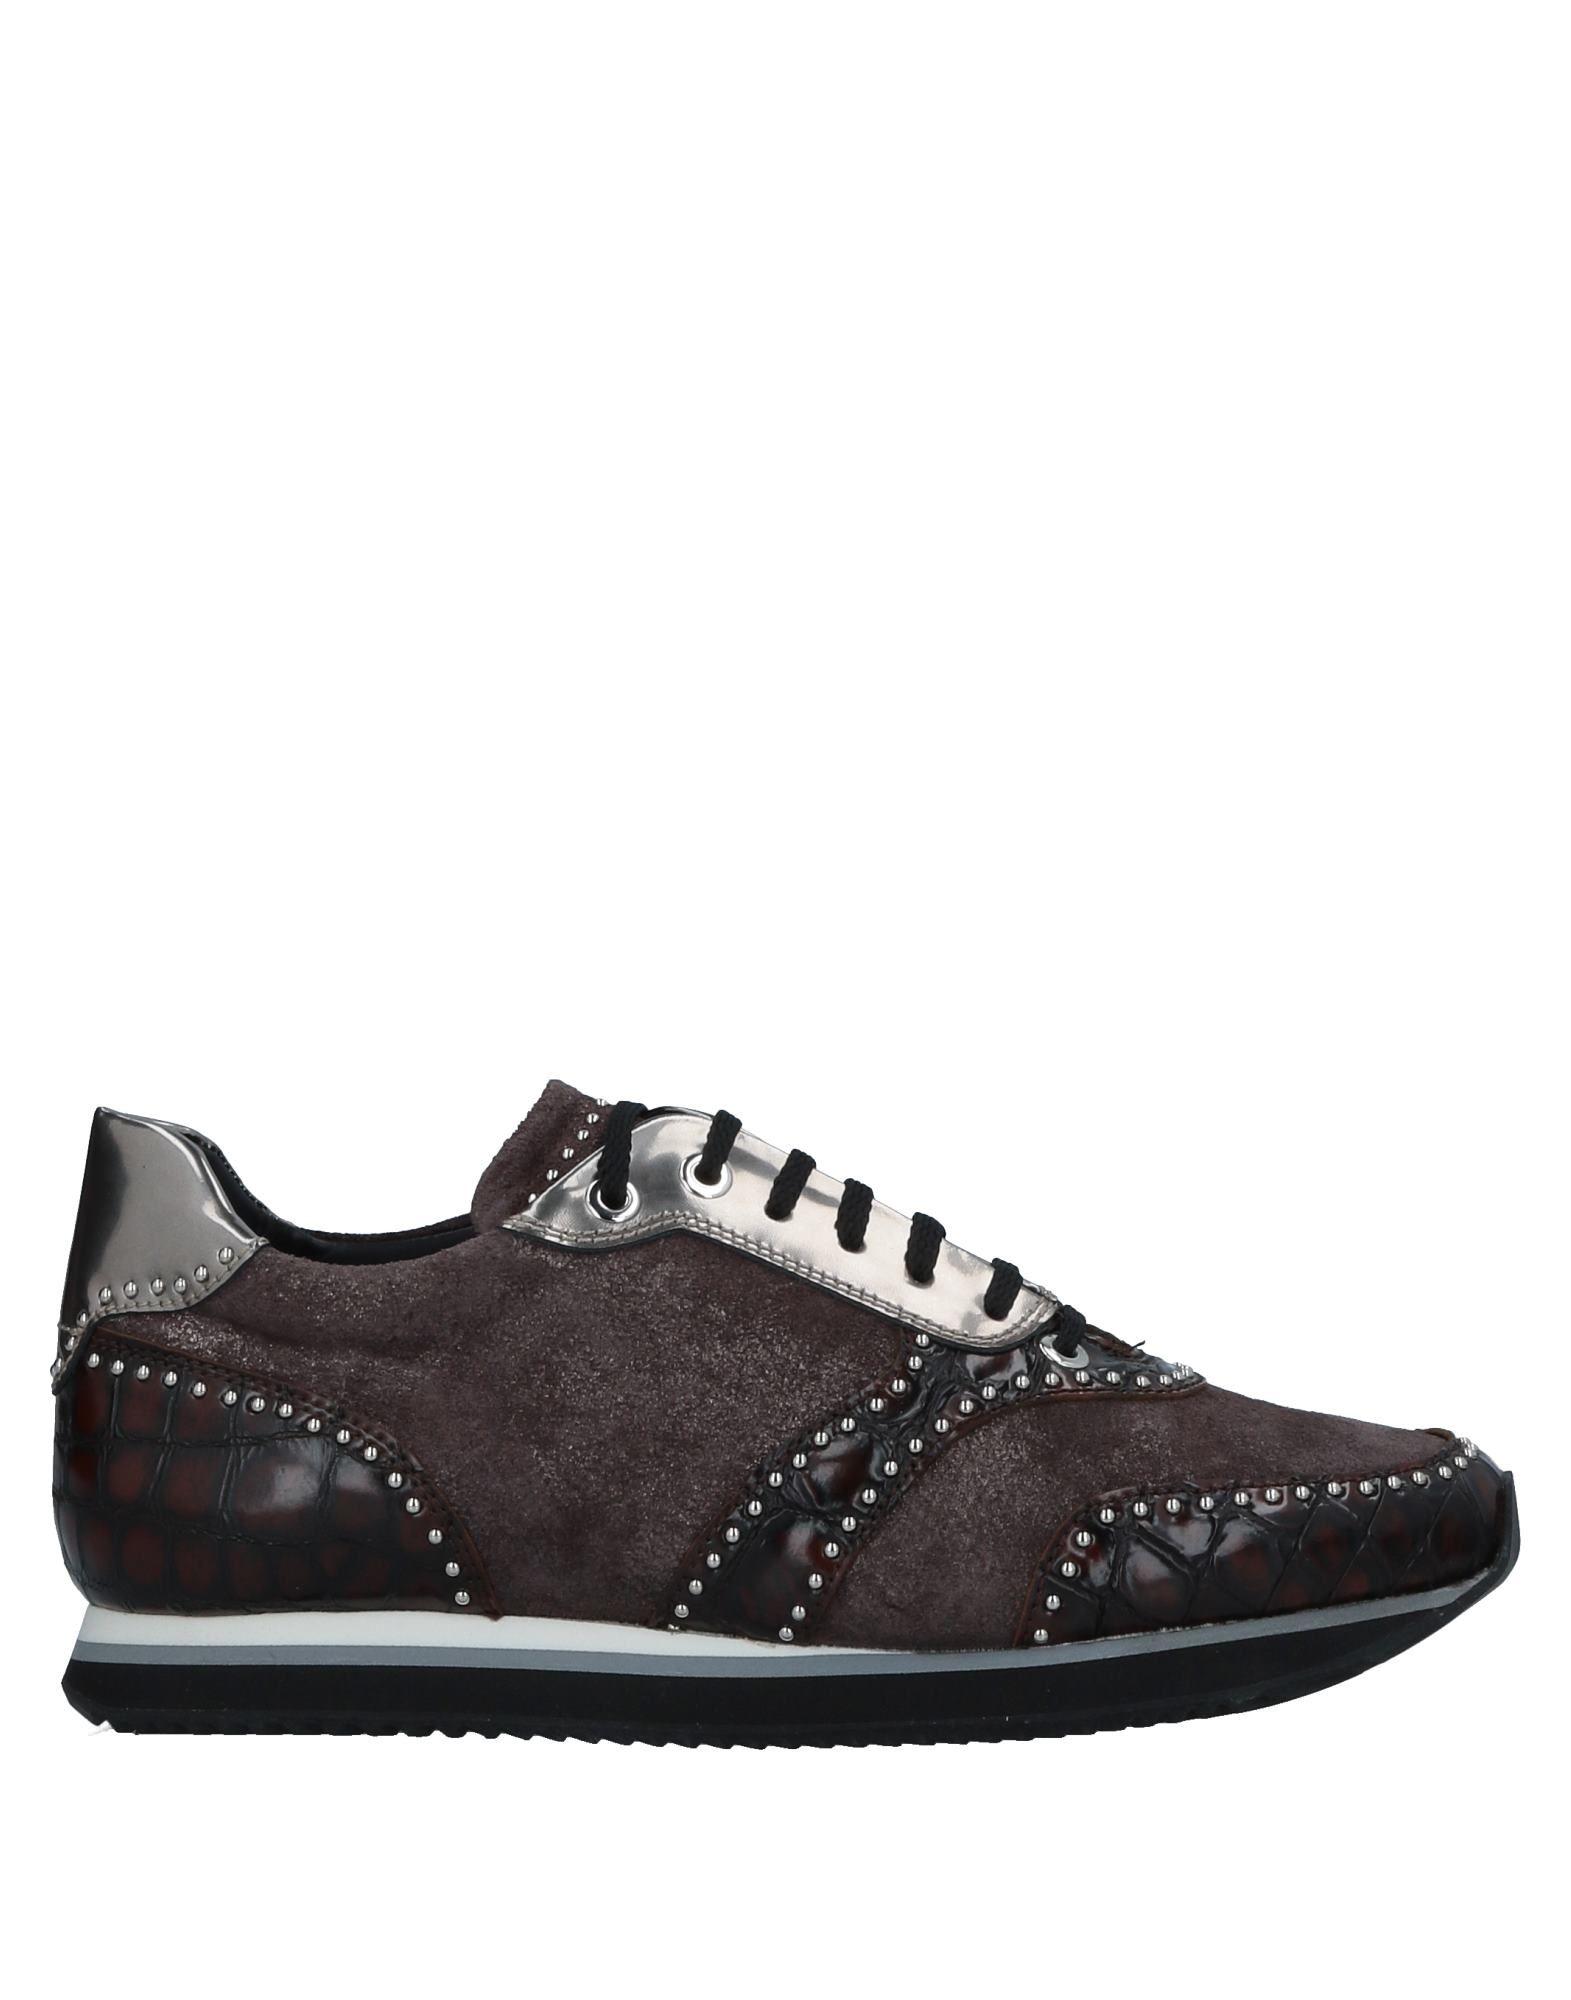 Moda Sneakers Pertini Donna - 11534827EG